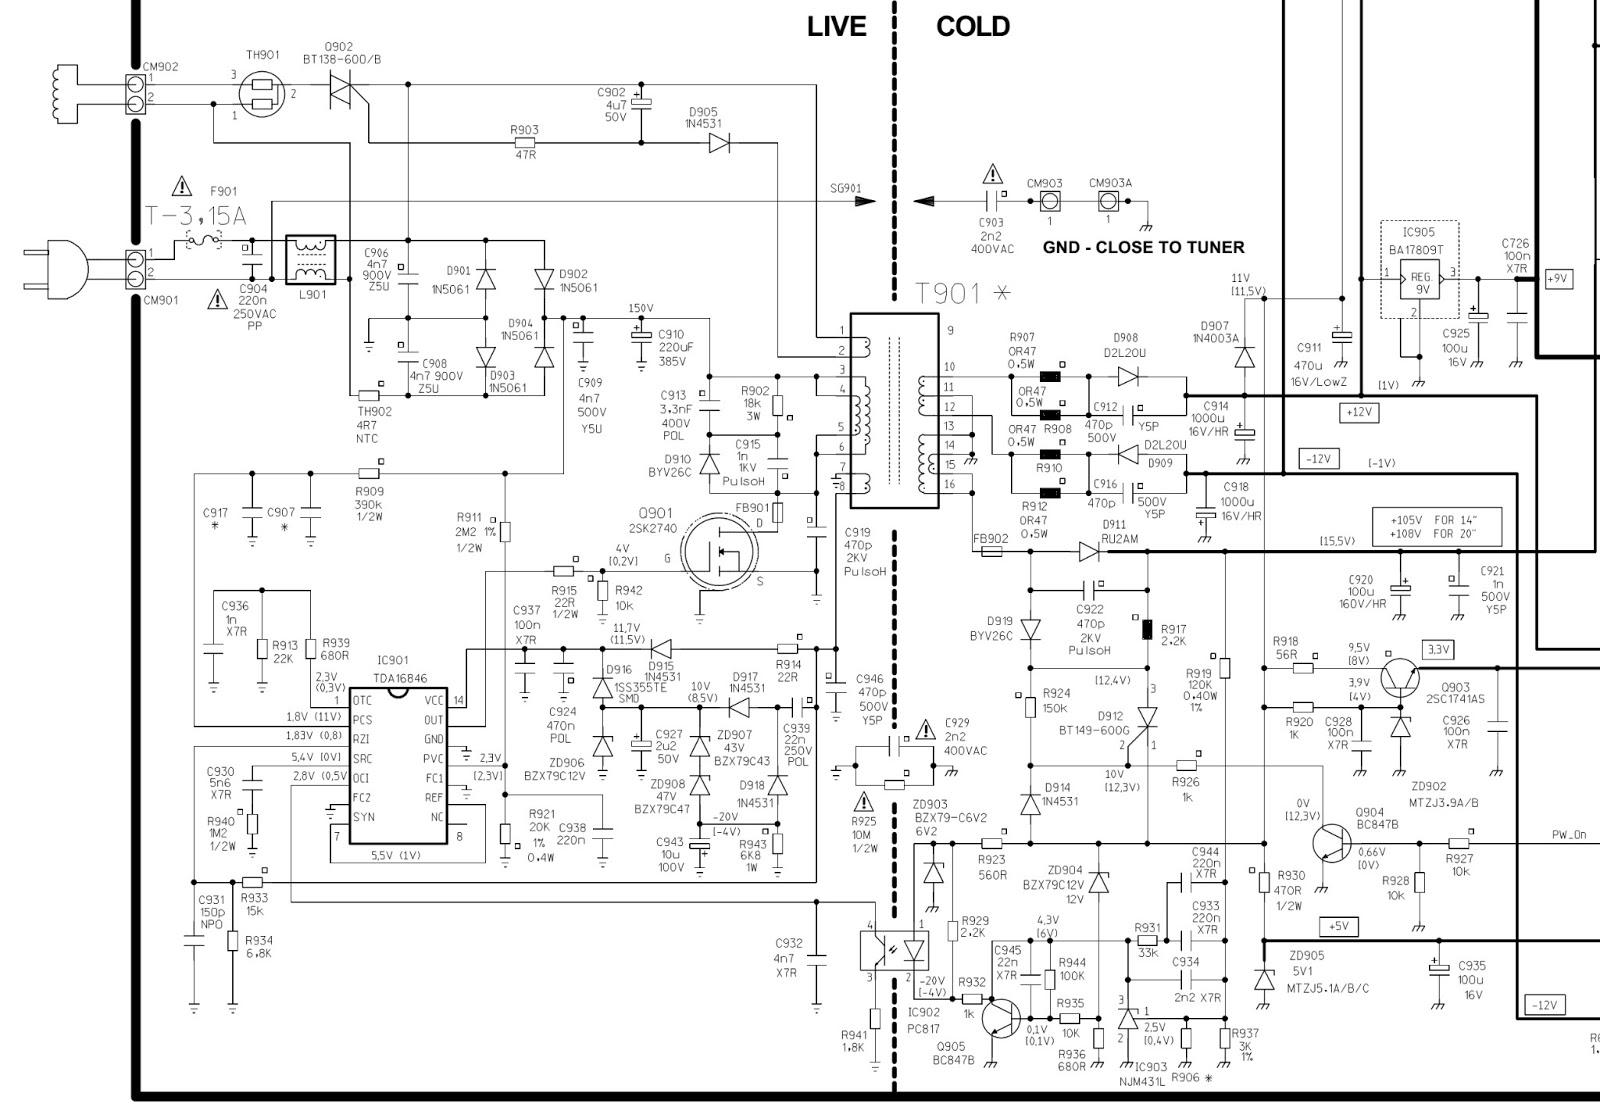 RCA  PROSCAN  GE  THOMSON CR14401 CR20401 MG13400 MG19400 MR13401 MR19401  HOW TO ENTER